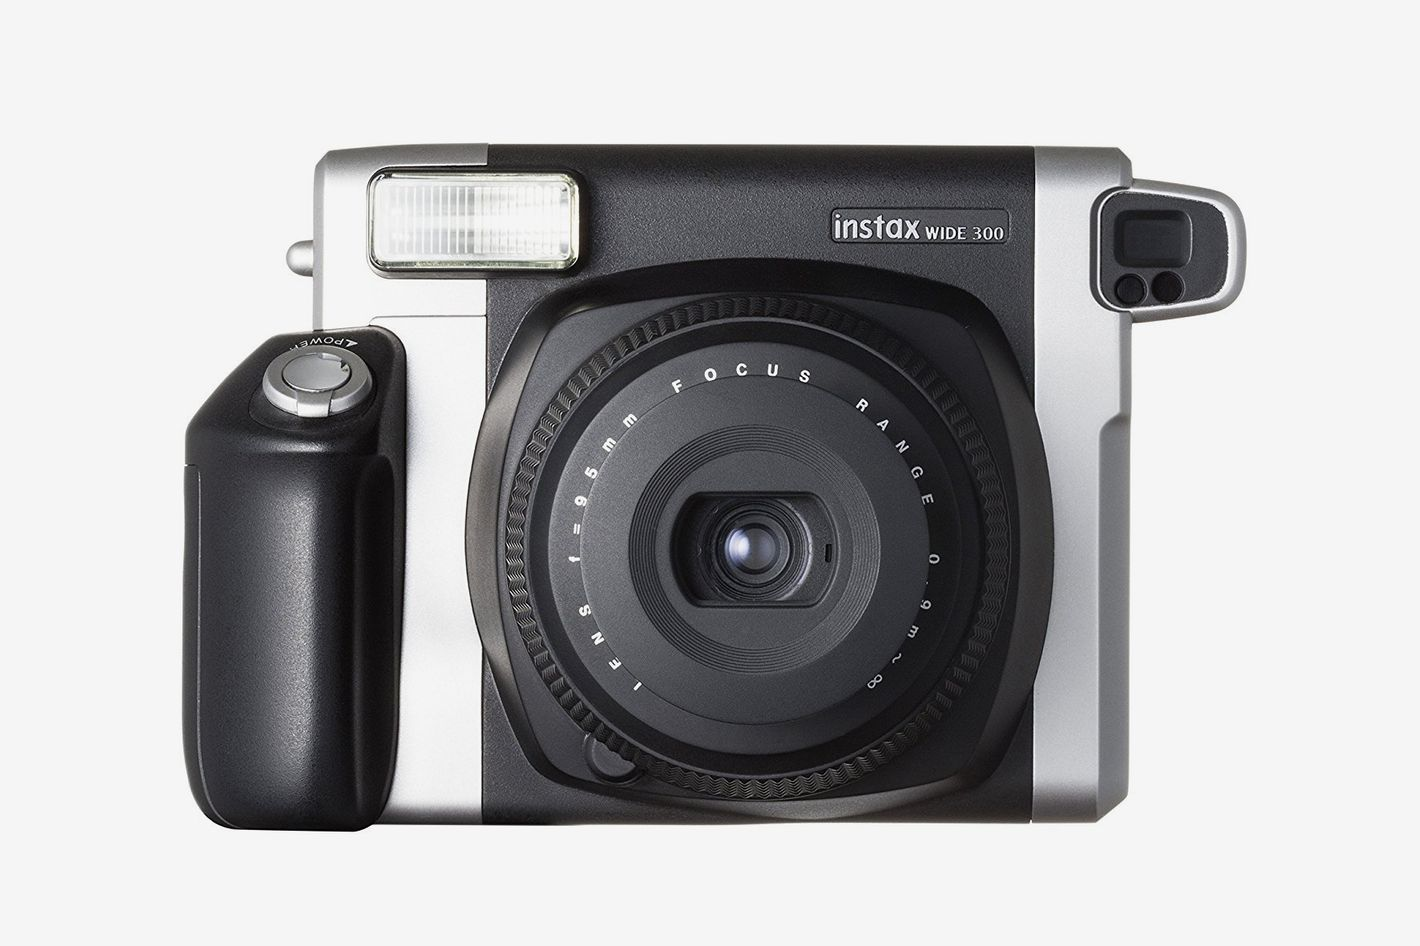 Fujifilm Instax Wide 300 Instant Film Camera (Black) and Instax Wide Instant Film, 20 Exposures